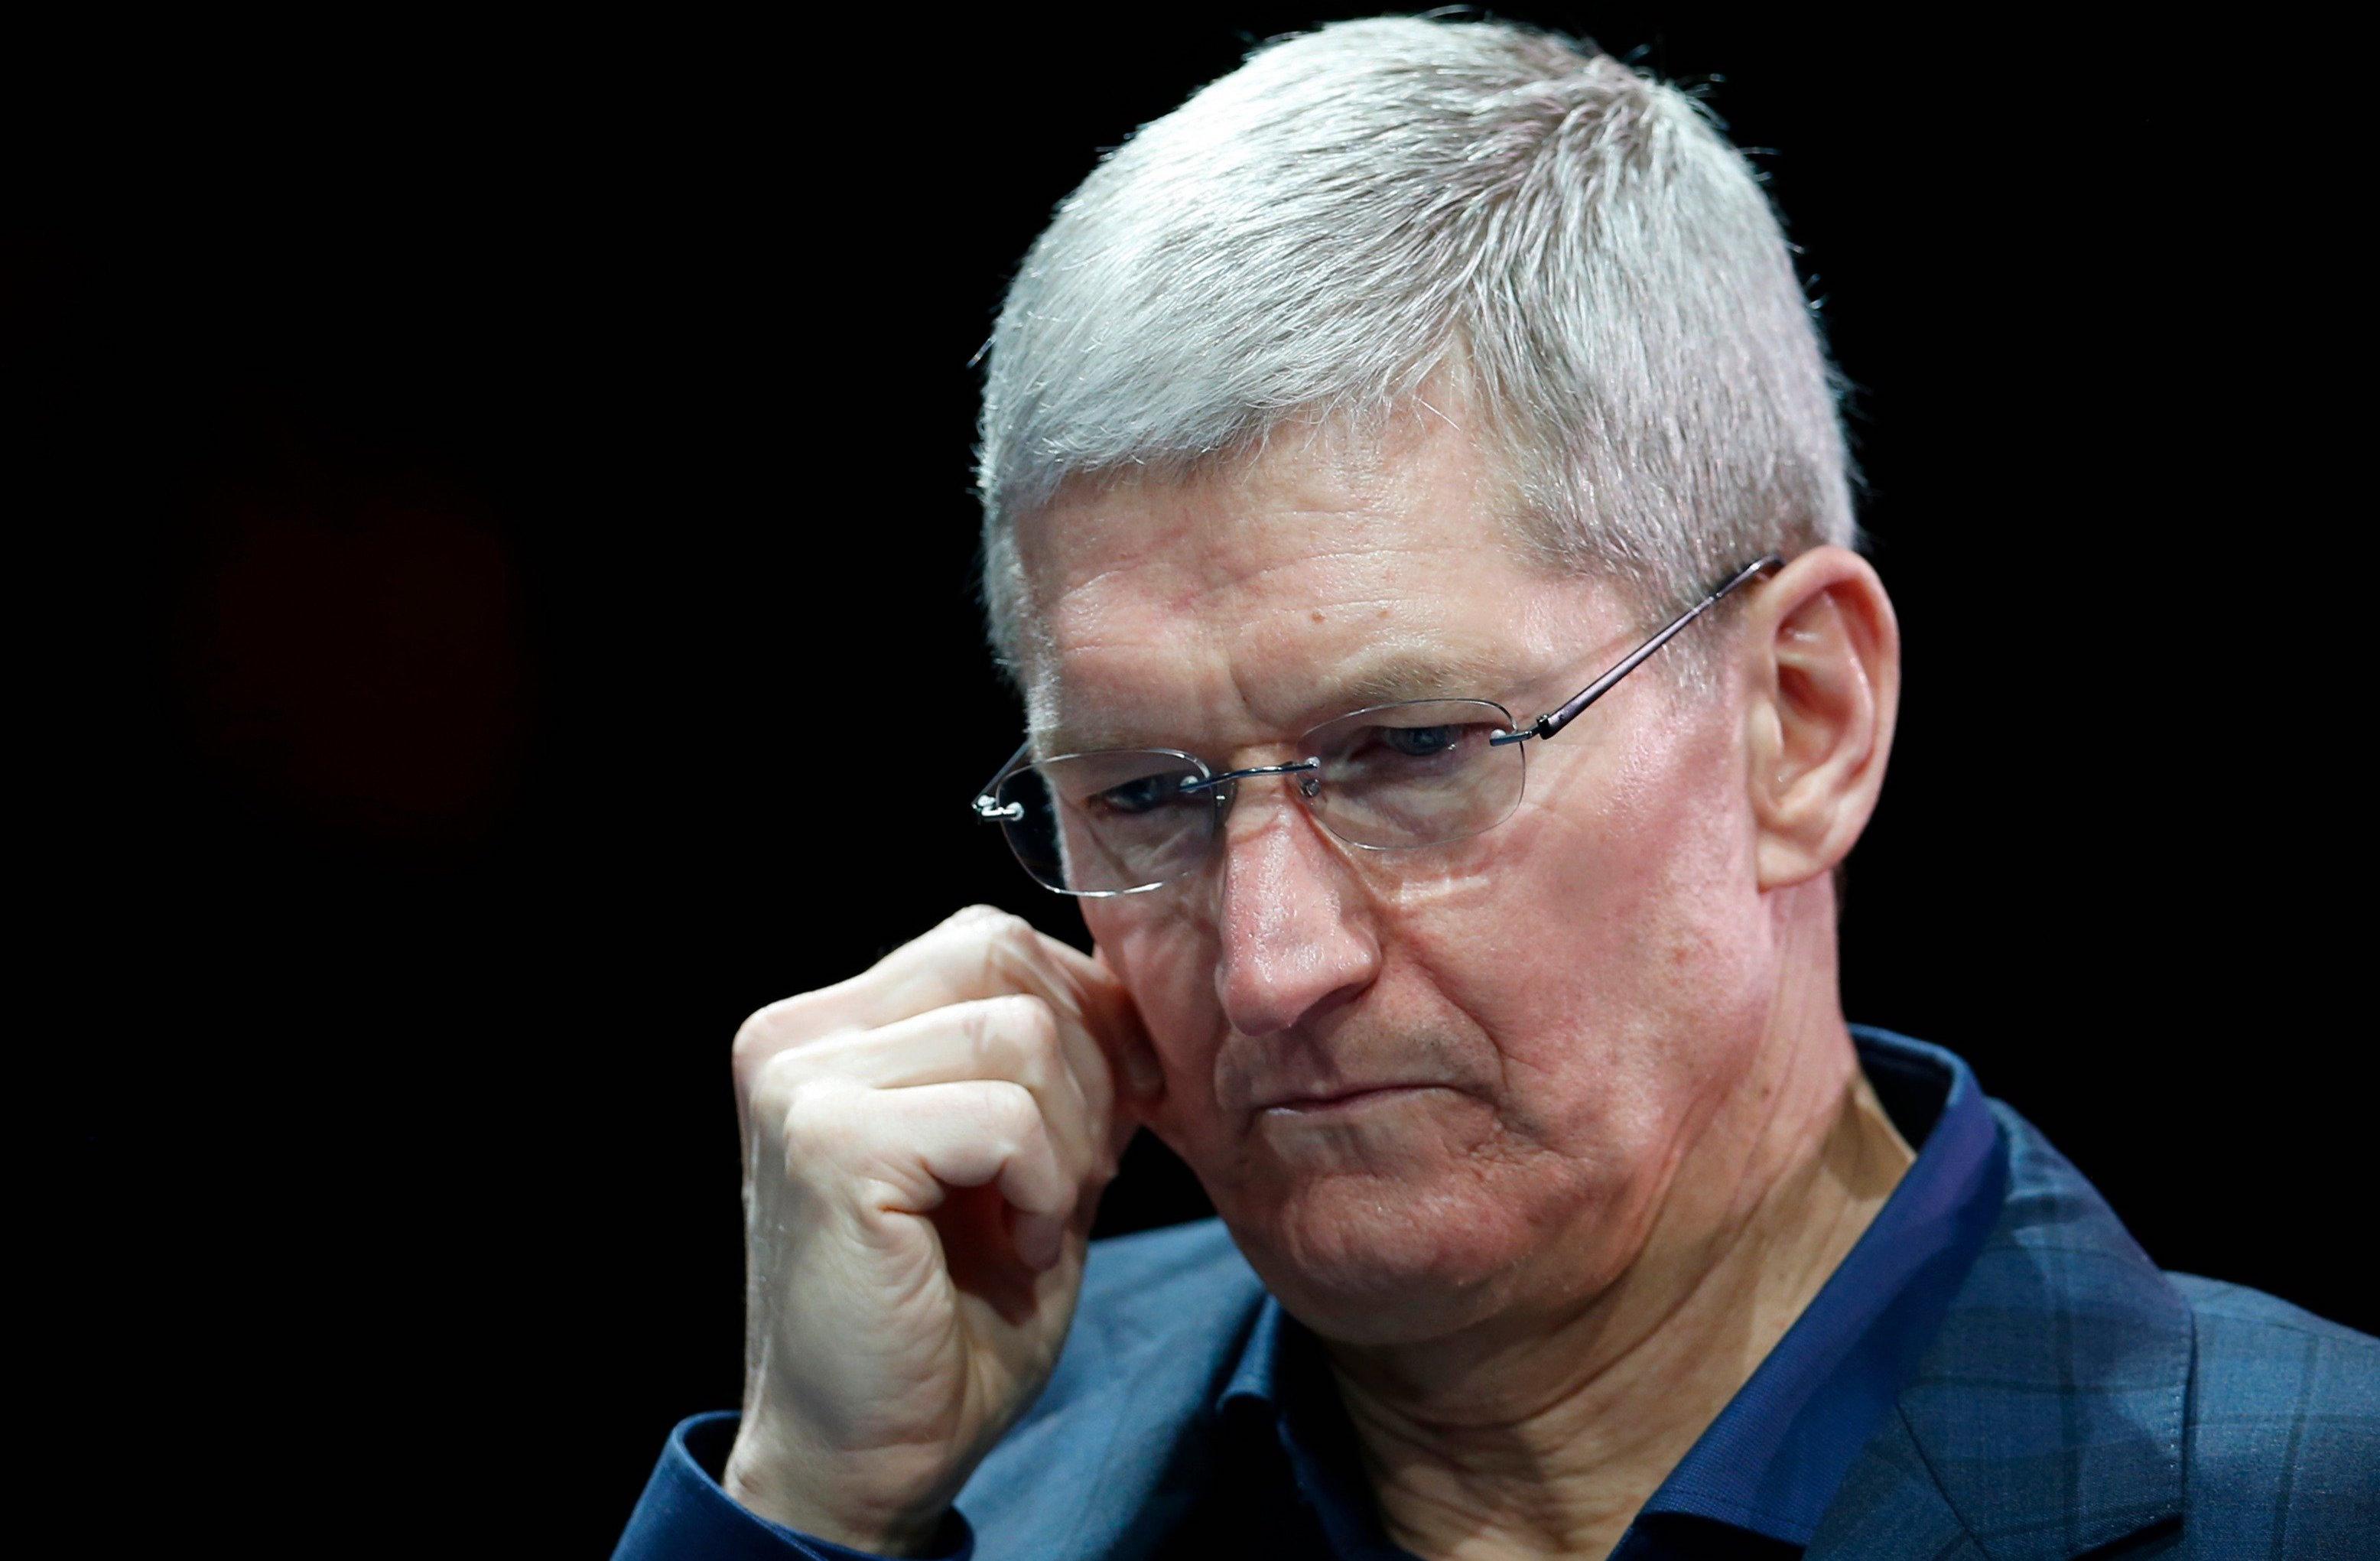 Russian officials put Apple at a disadvantage